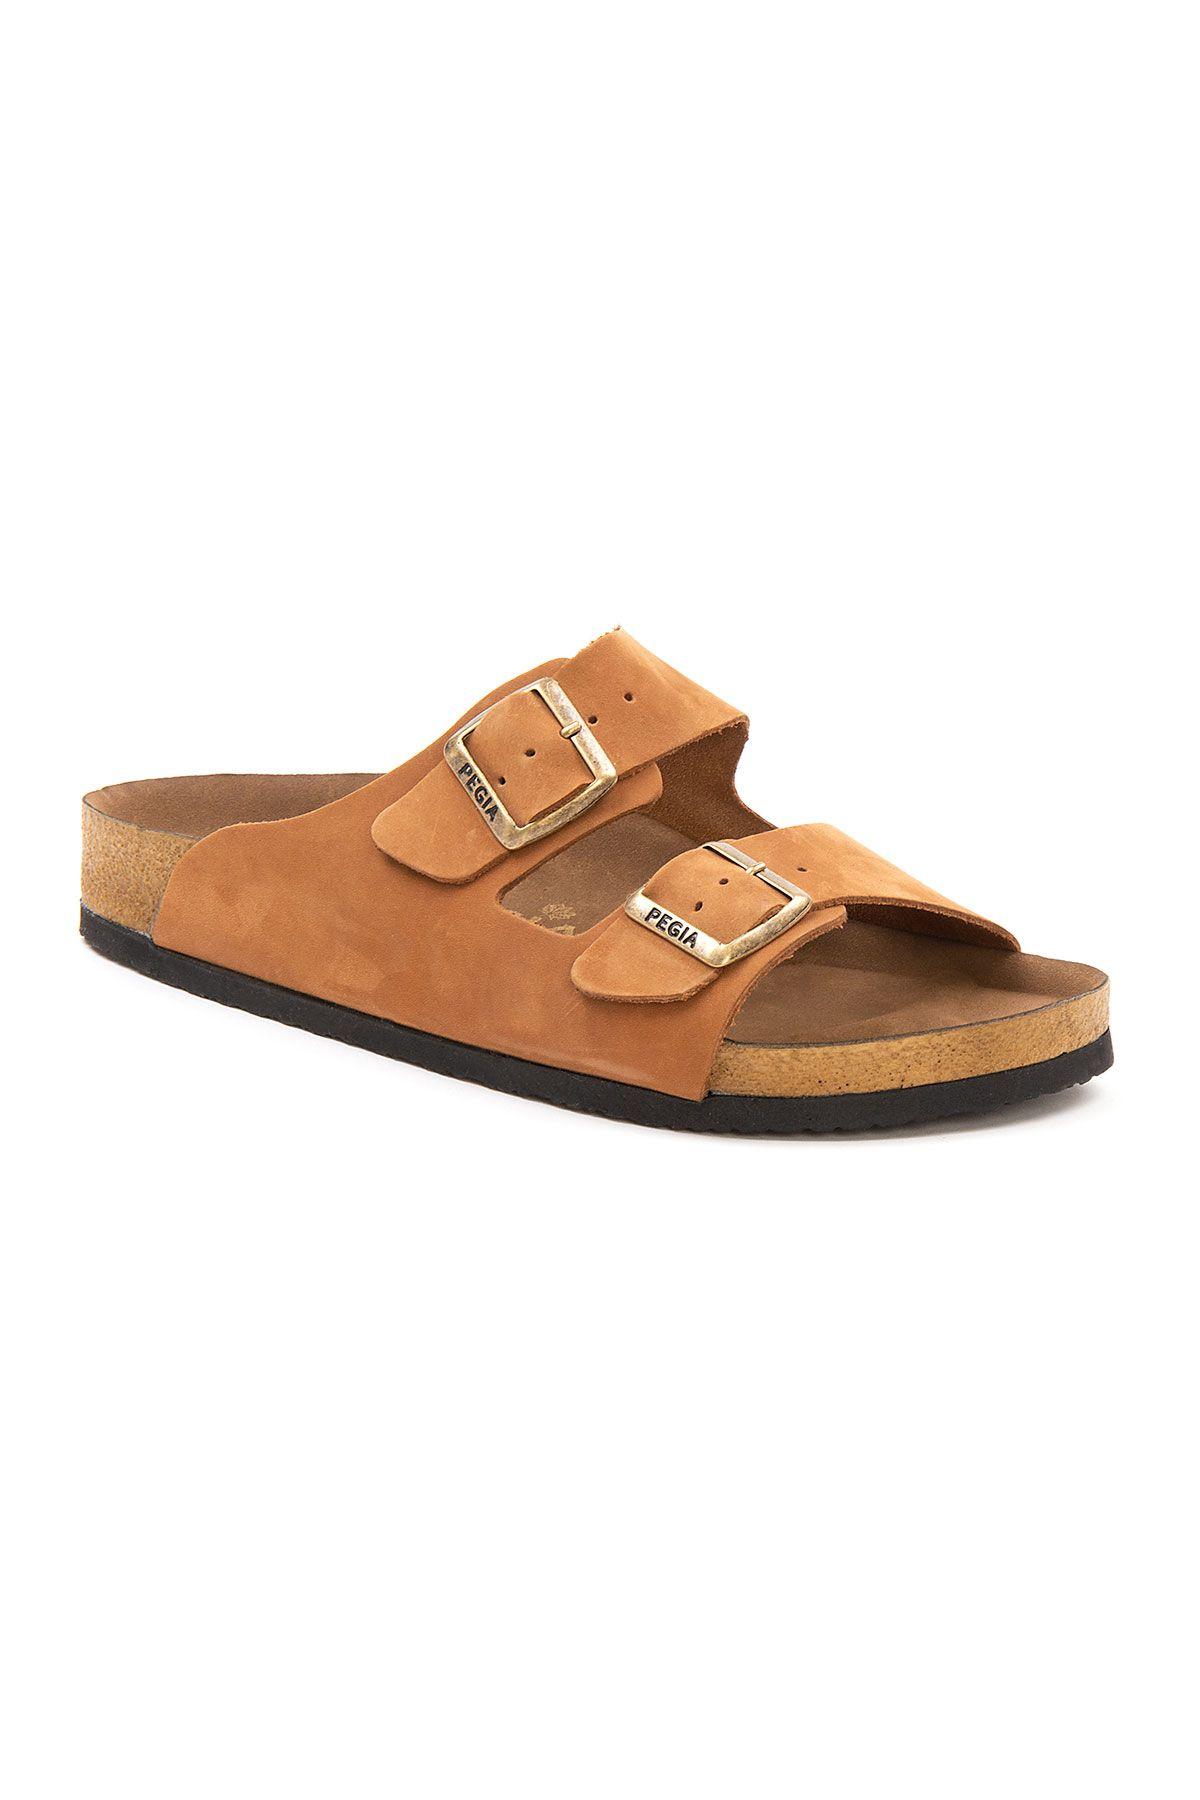 Pegia Men's Genuine Leather Slippers 215020 Ginger